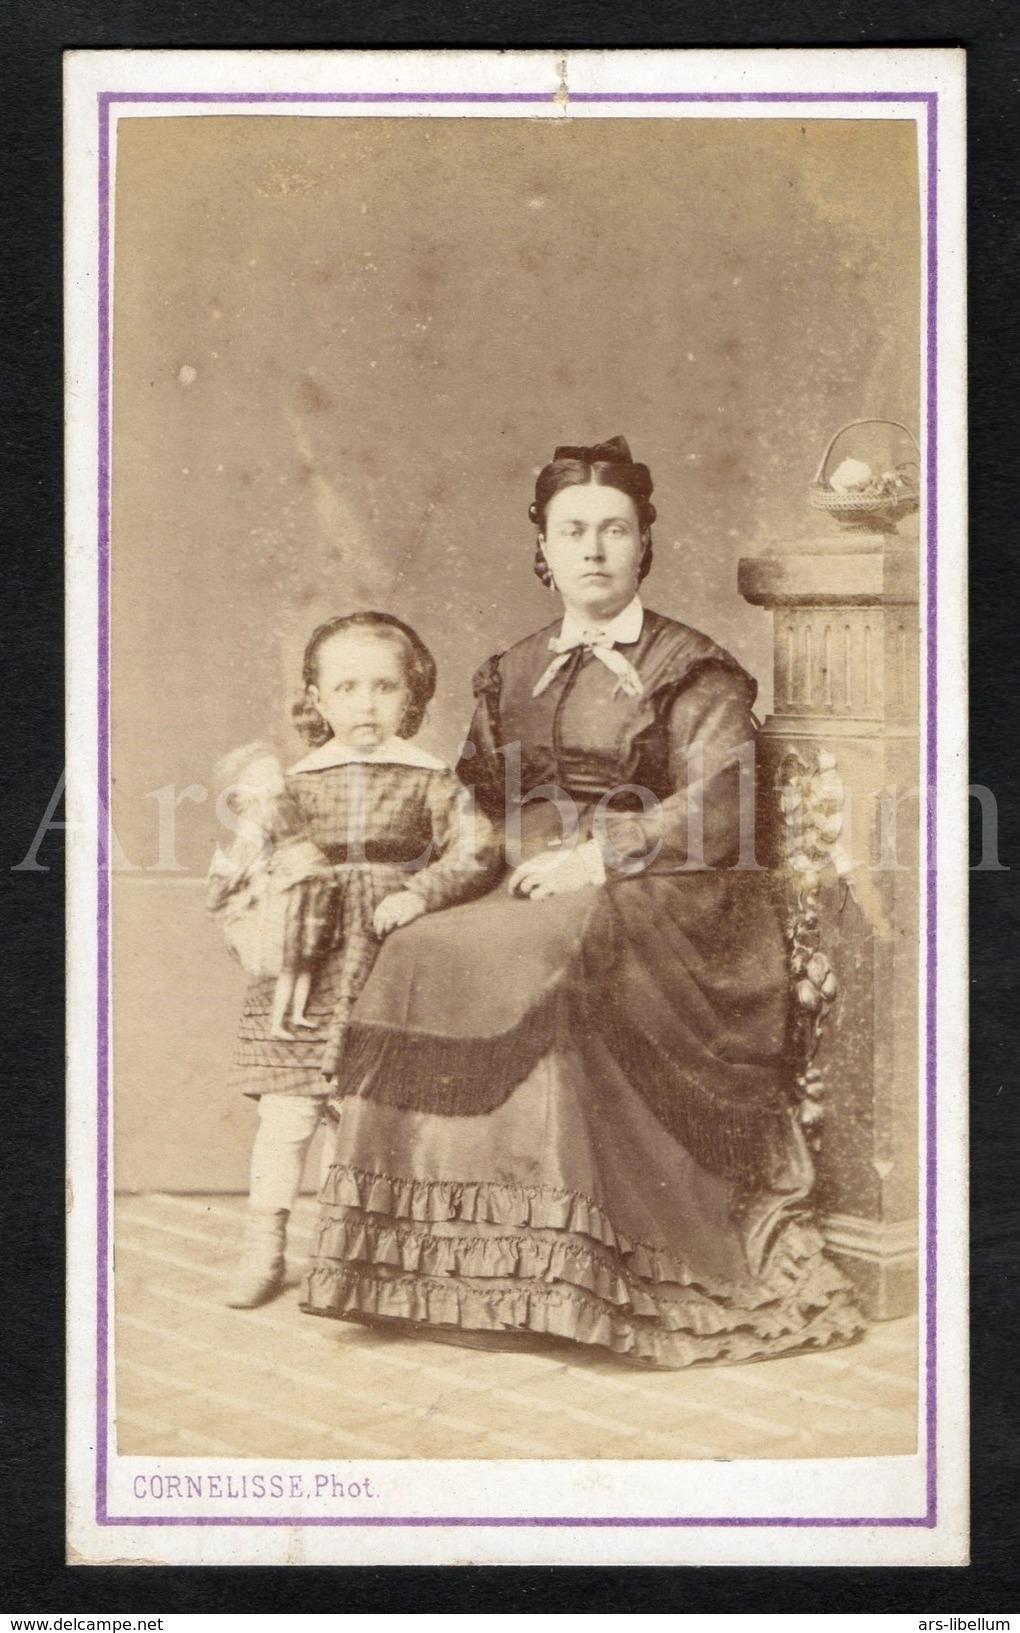 Photo-carte De Visite / CDV / W / Foto / Fille / Girl / Femme / Woman / Doll / Pop / Photo Cornelisse / Bruxelles - Anciennes (Av. 1900)